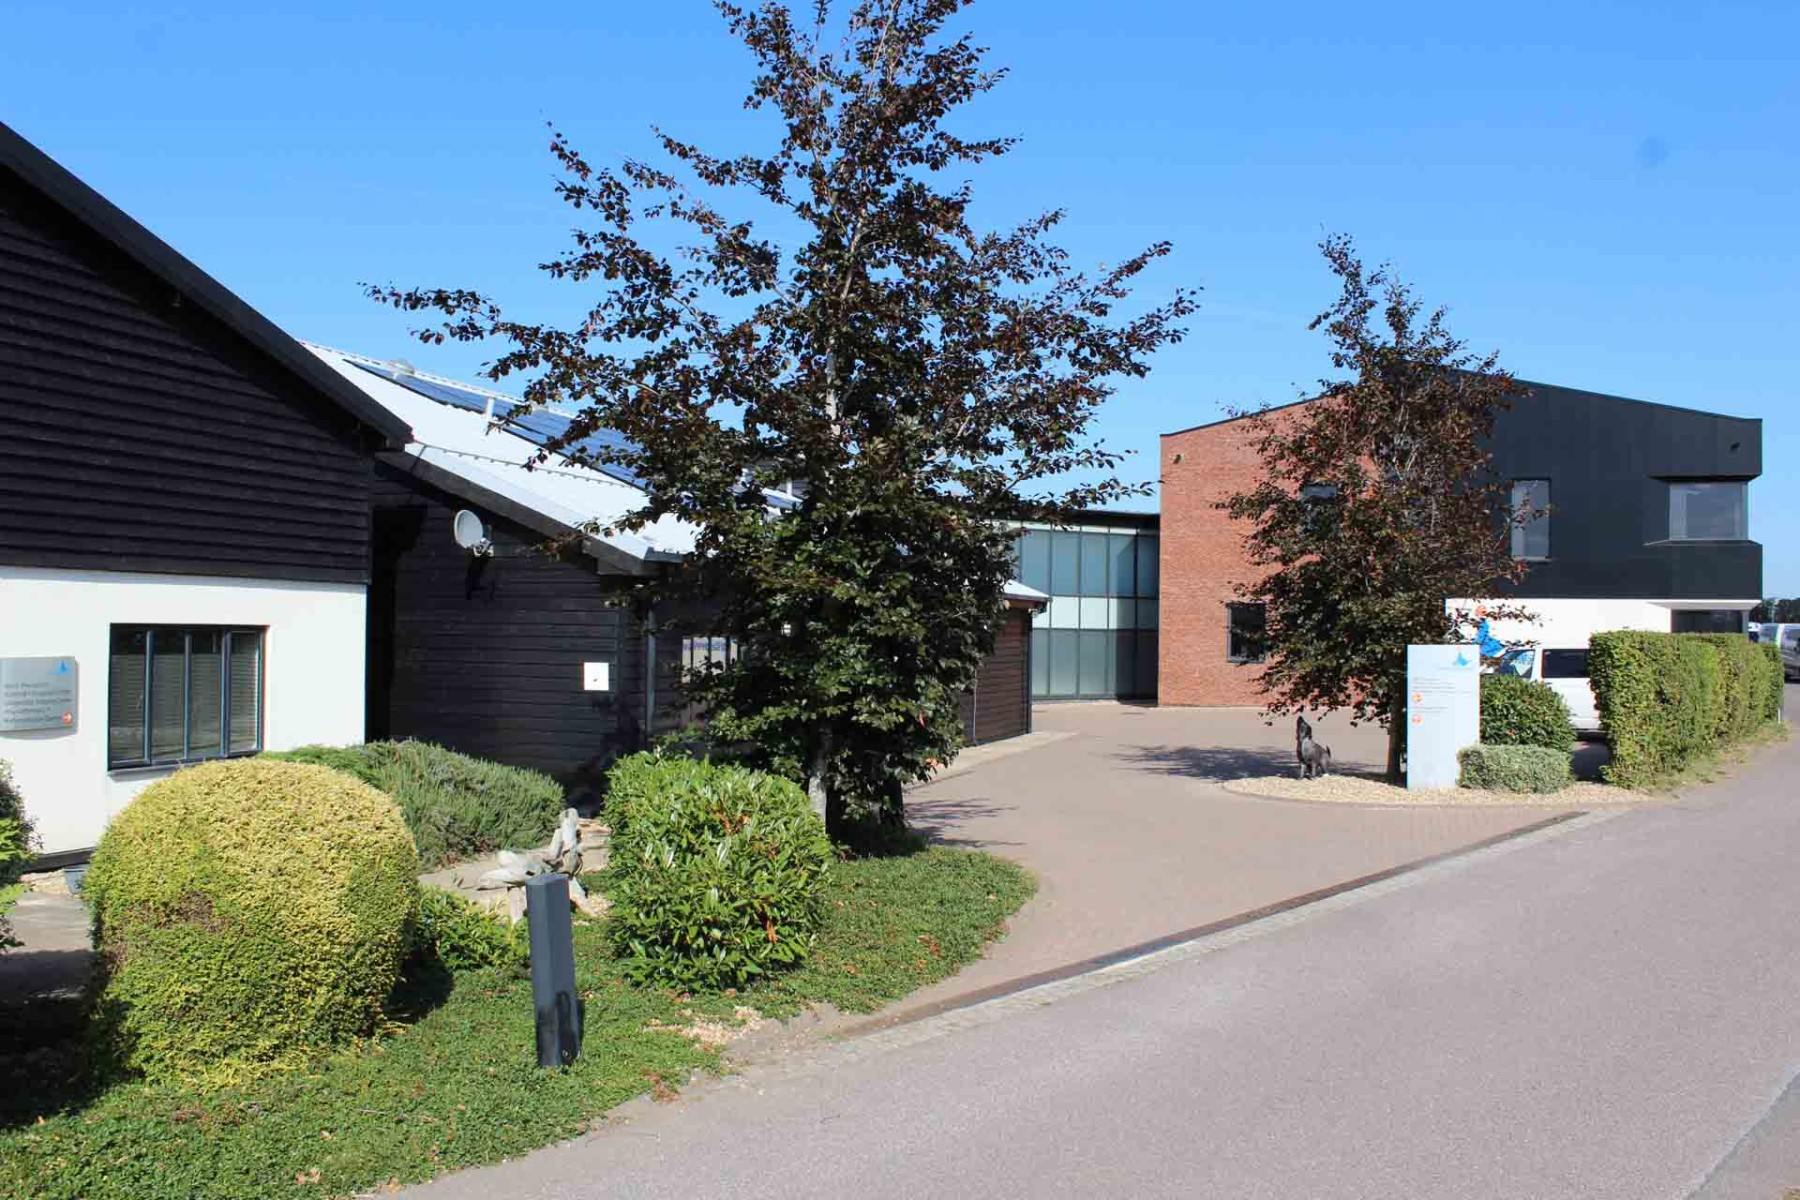 Fitzpatrick Referrals Orthopaedics & Neurology practice in Eashing, Surrey